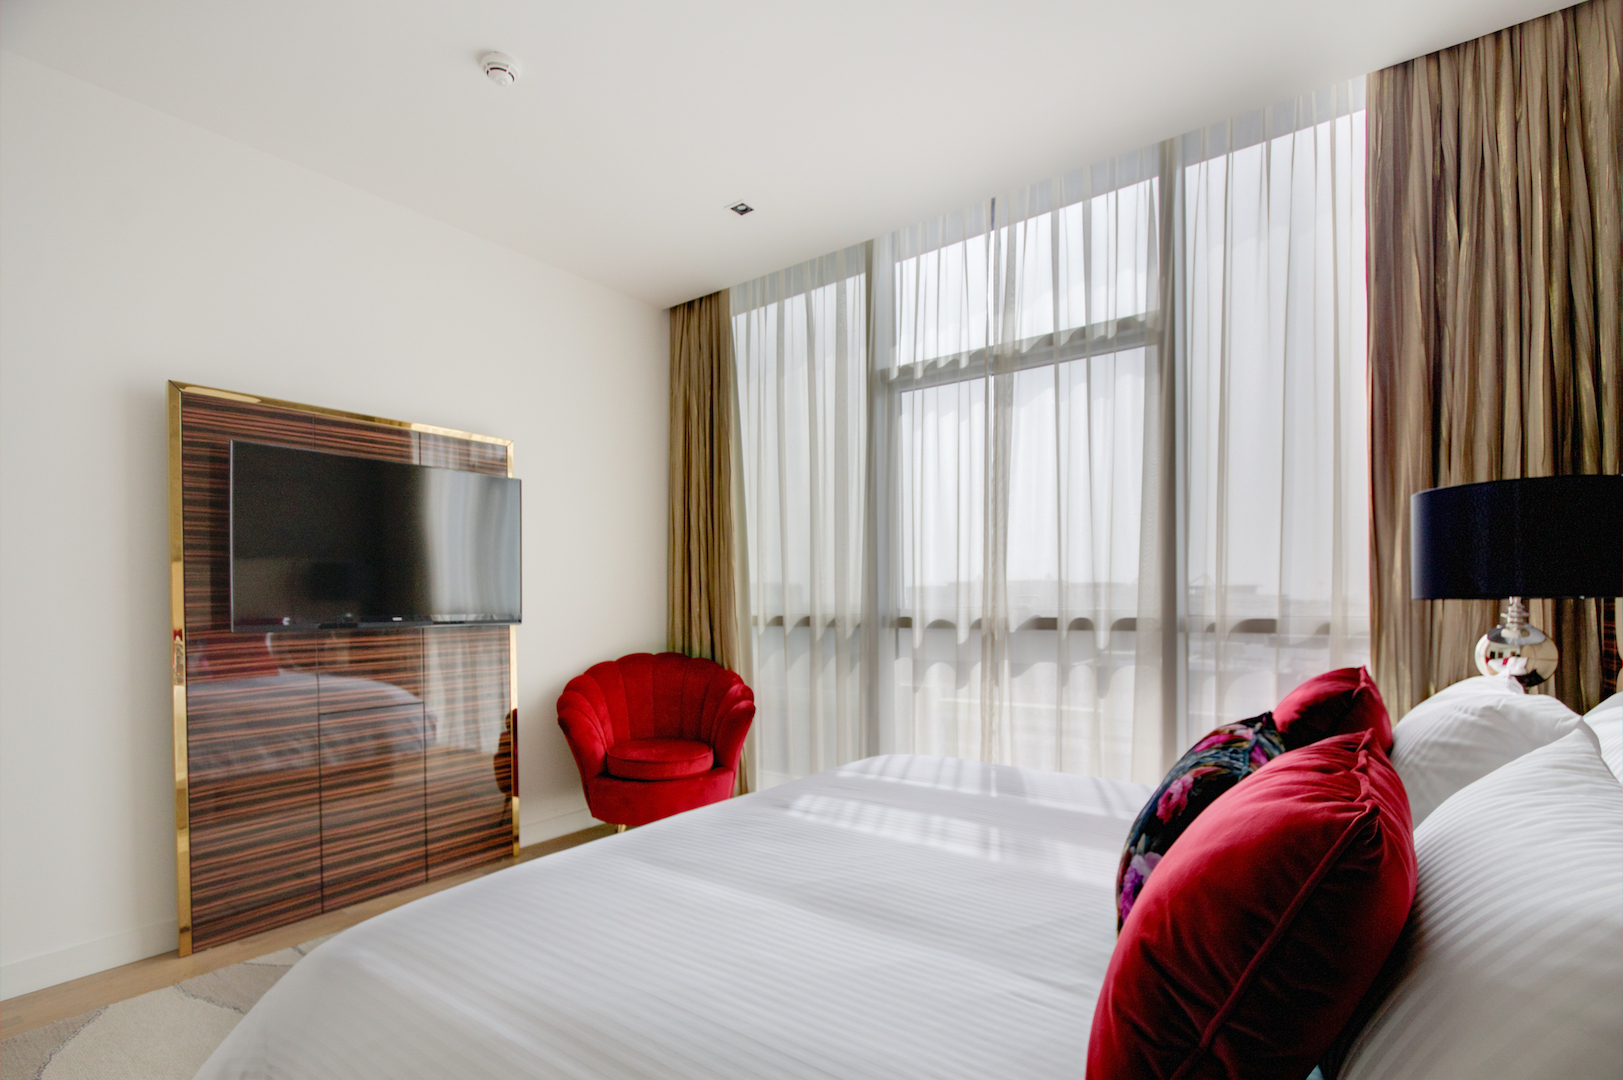 Apartment Elegant 1 BR in City Walk B1 602 photo 20906846